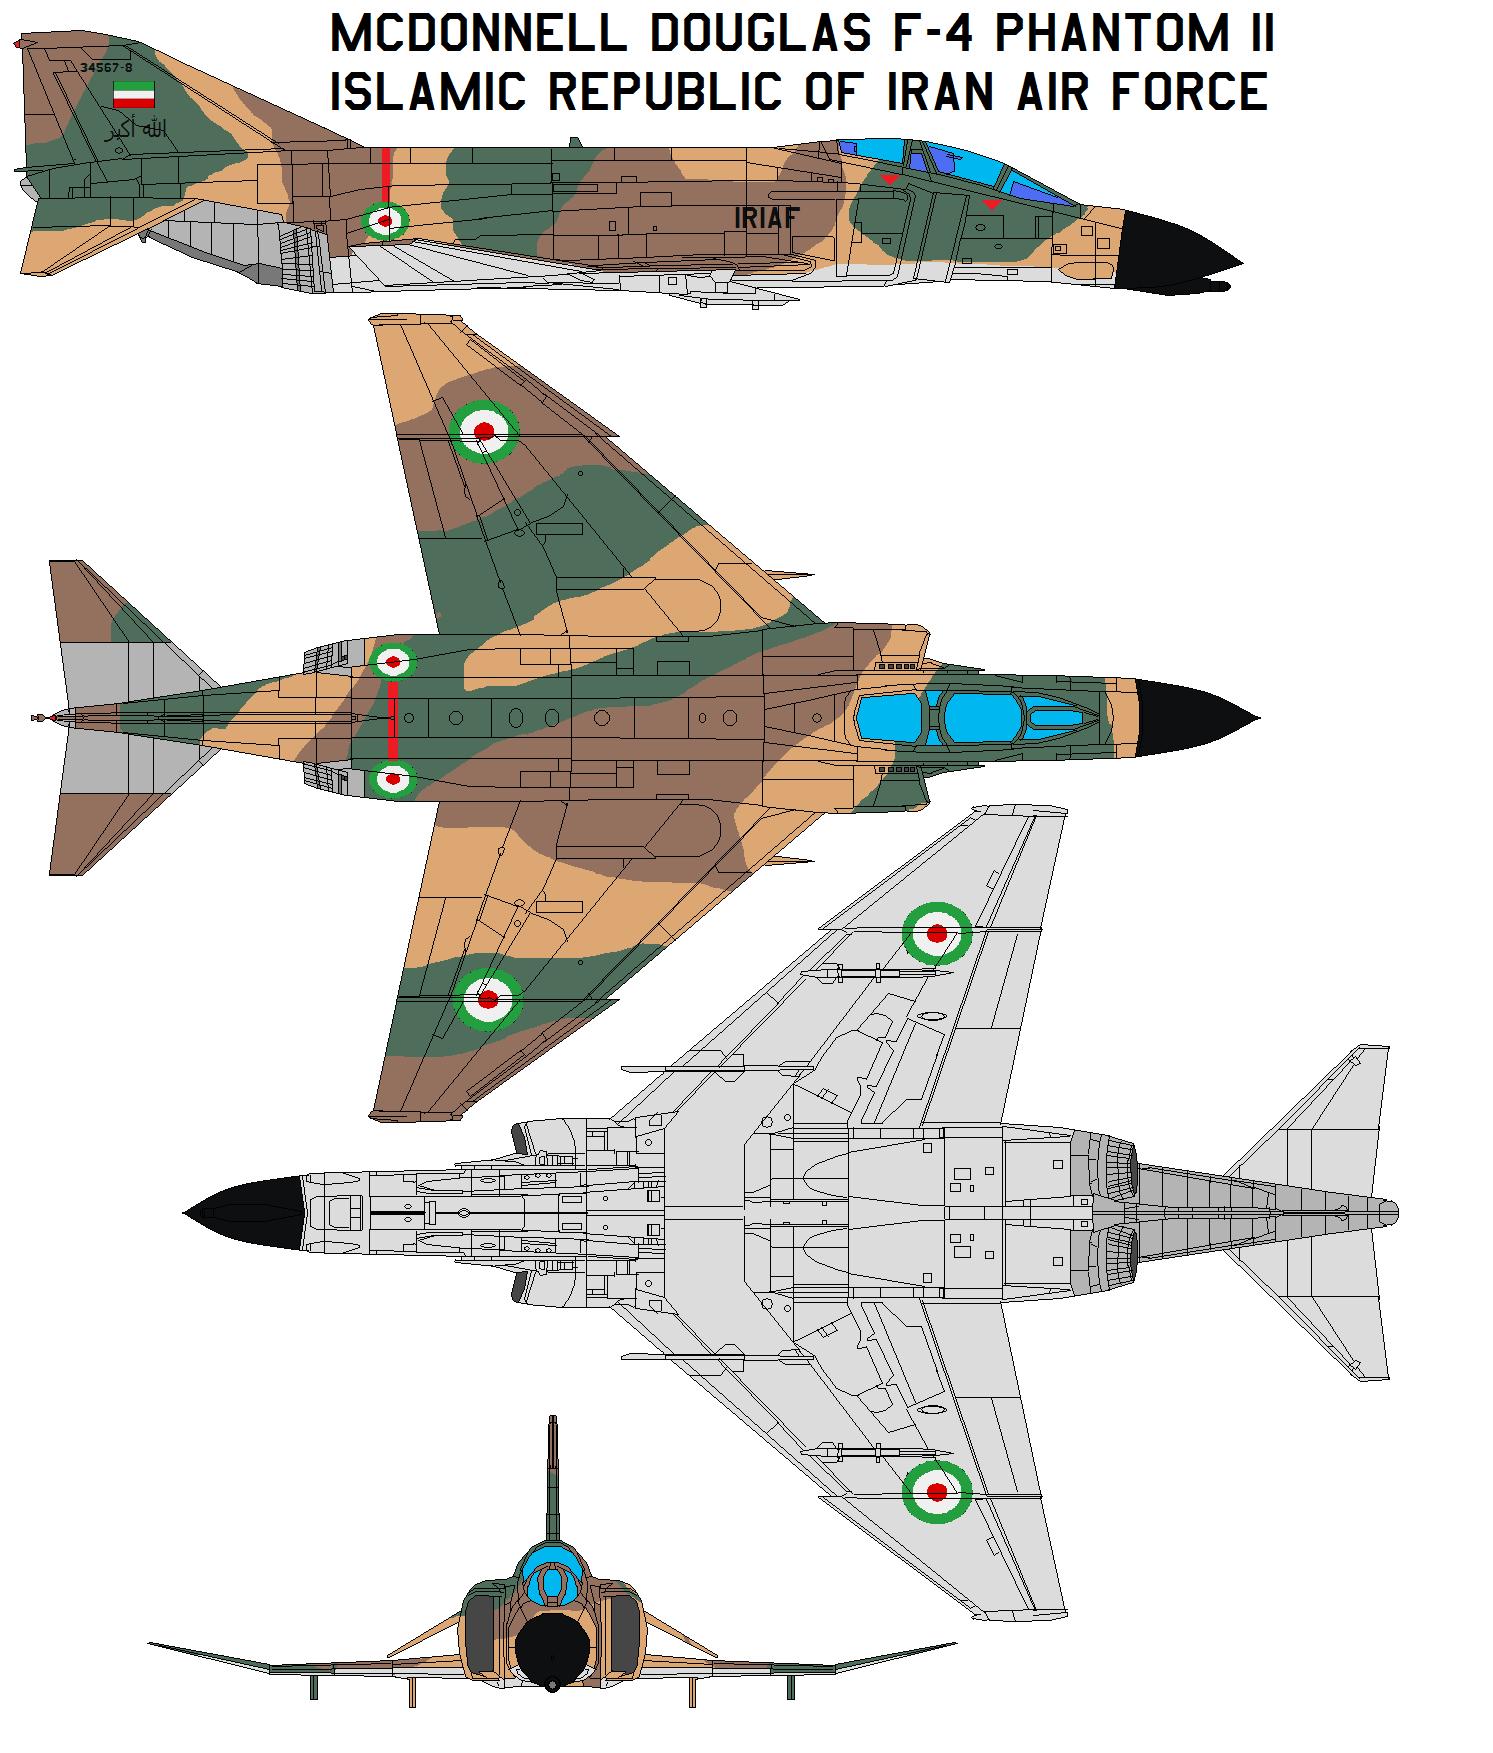 F-4 Phantom IRIAF by bagera3005